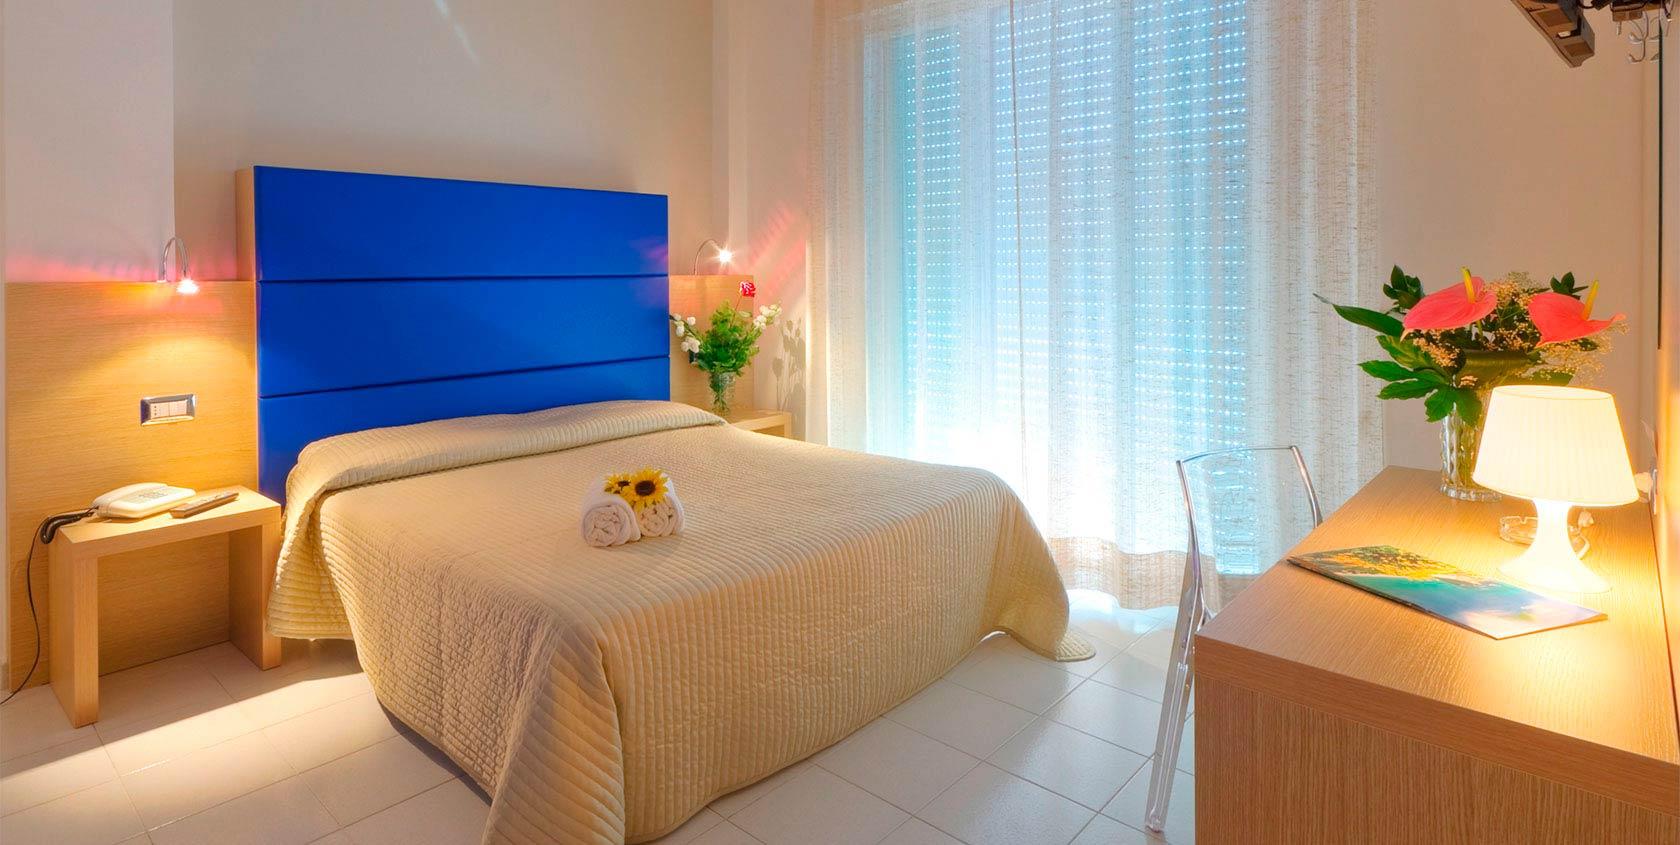 Hotel Marcelli di Numana | Hotel Kon Tiki